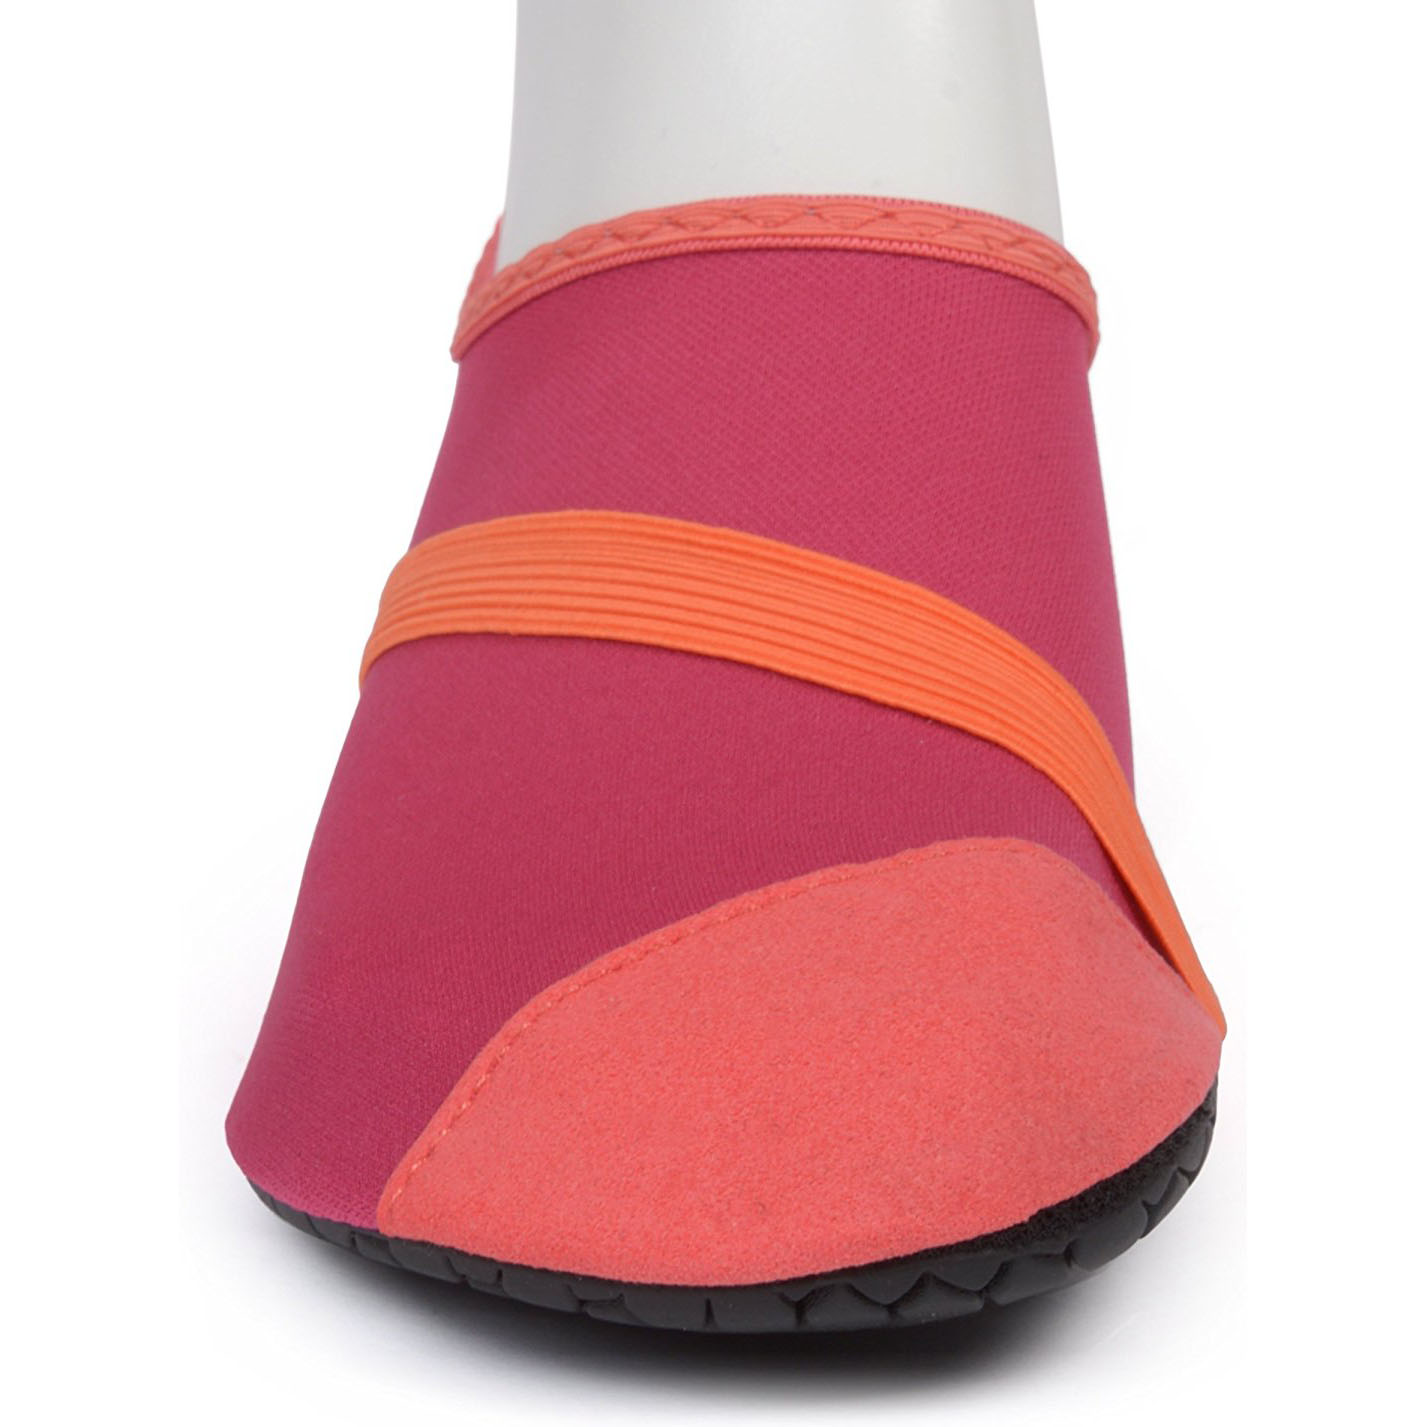 FitKicks-Women-039-s-Non-Slip-Sole-Active-Footwear thumbnail 21